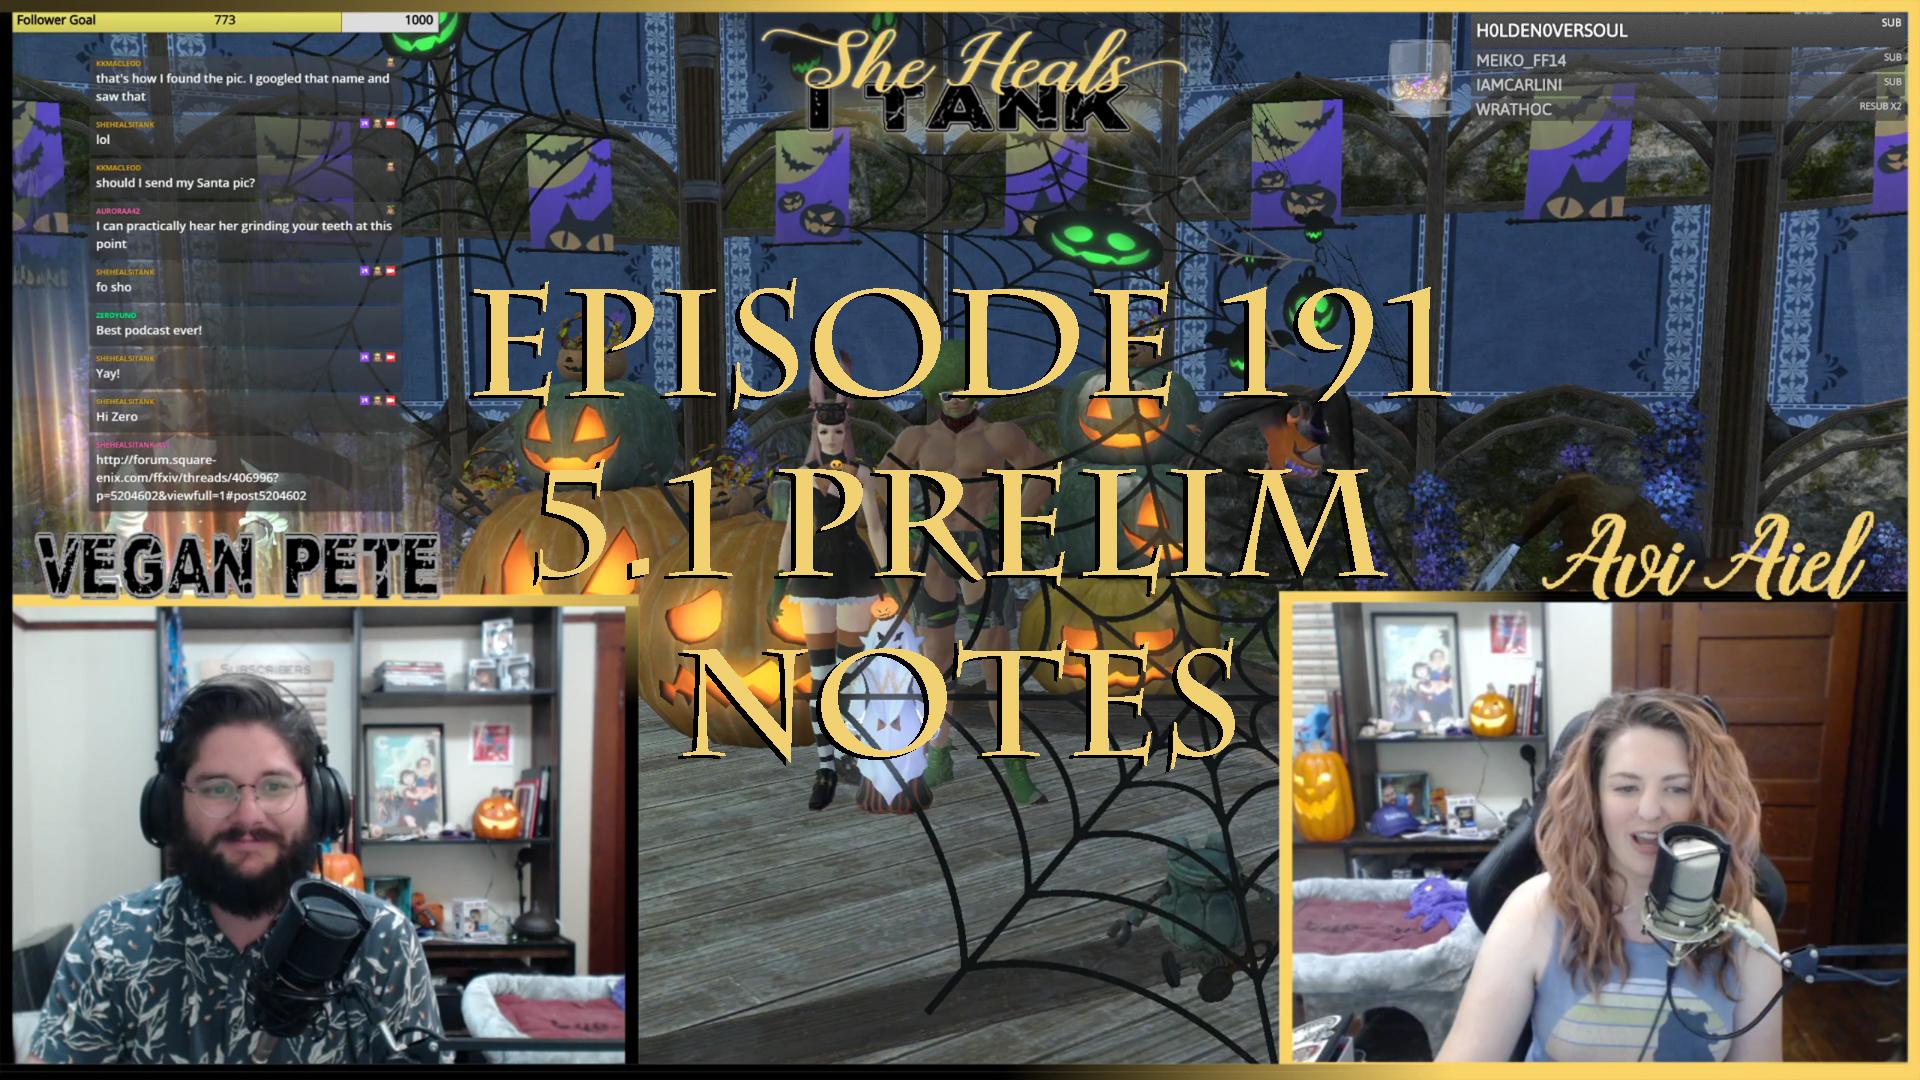 A Weekly Final Fantasy XIV (FFXIV) Podcast - She Heals I Tank